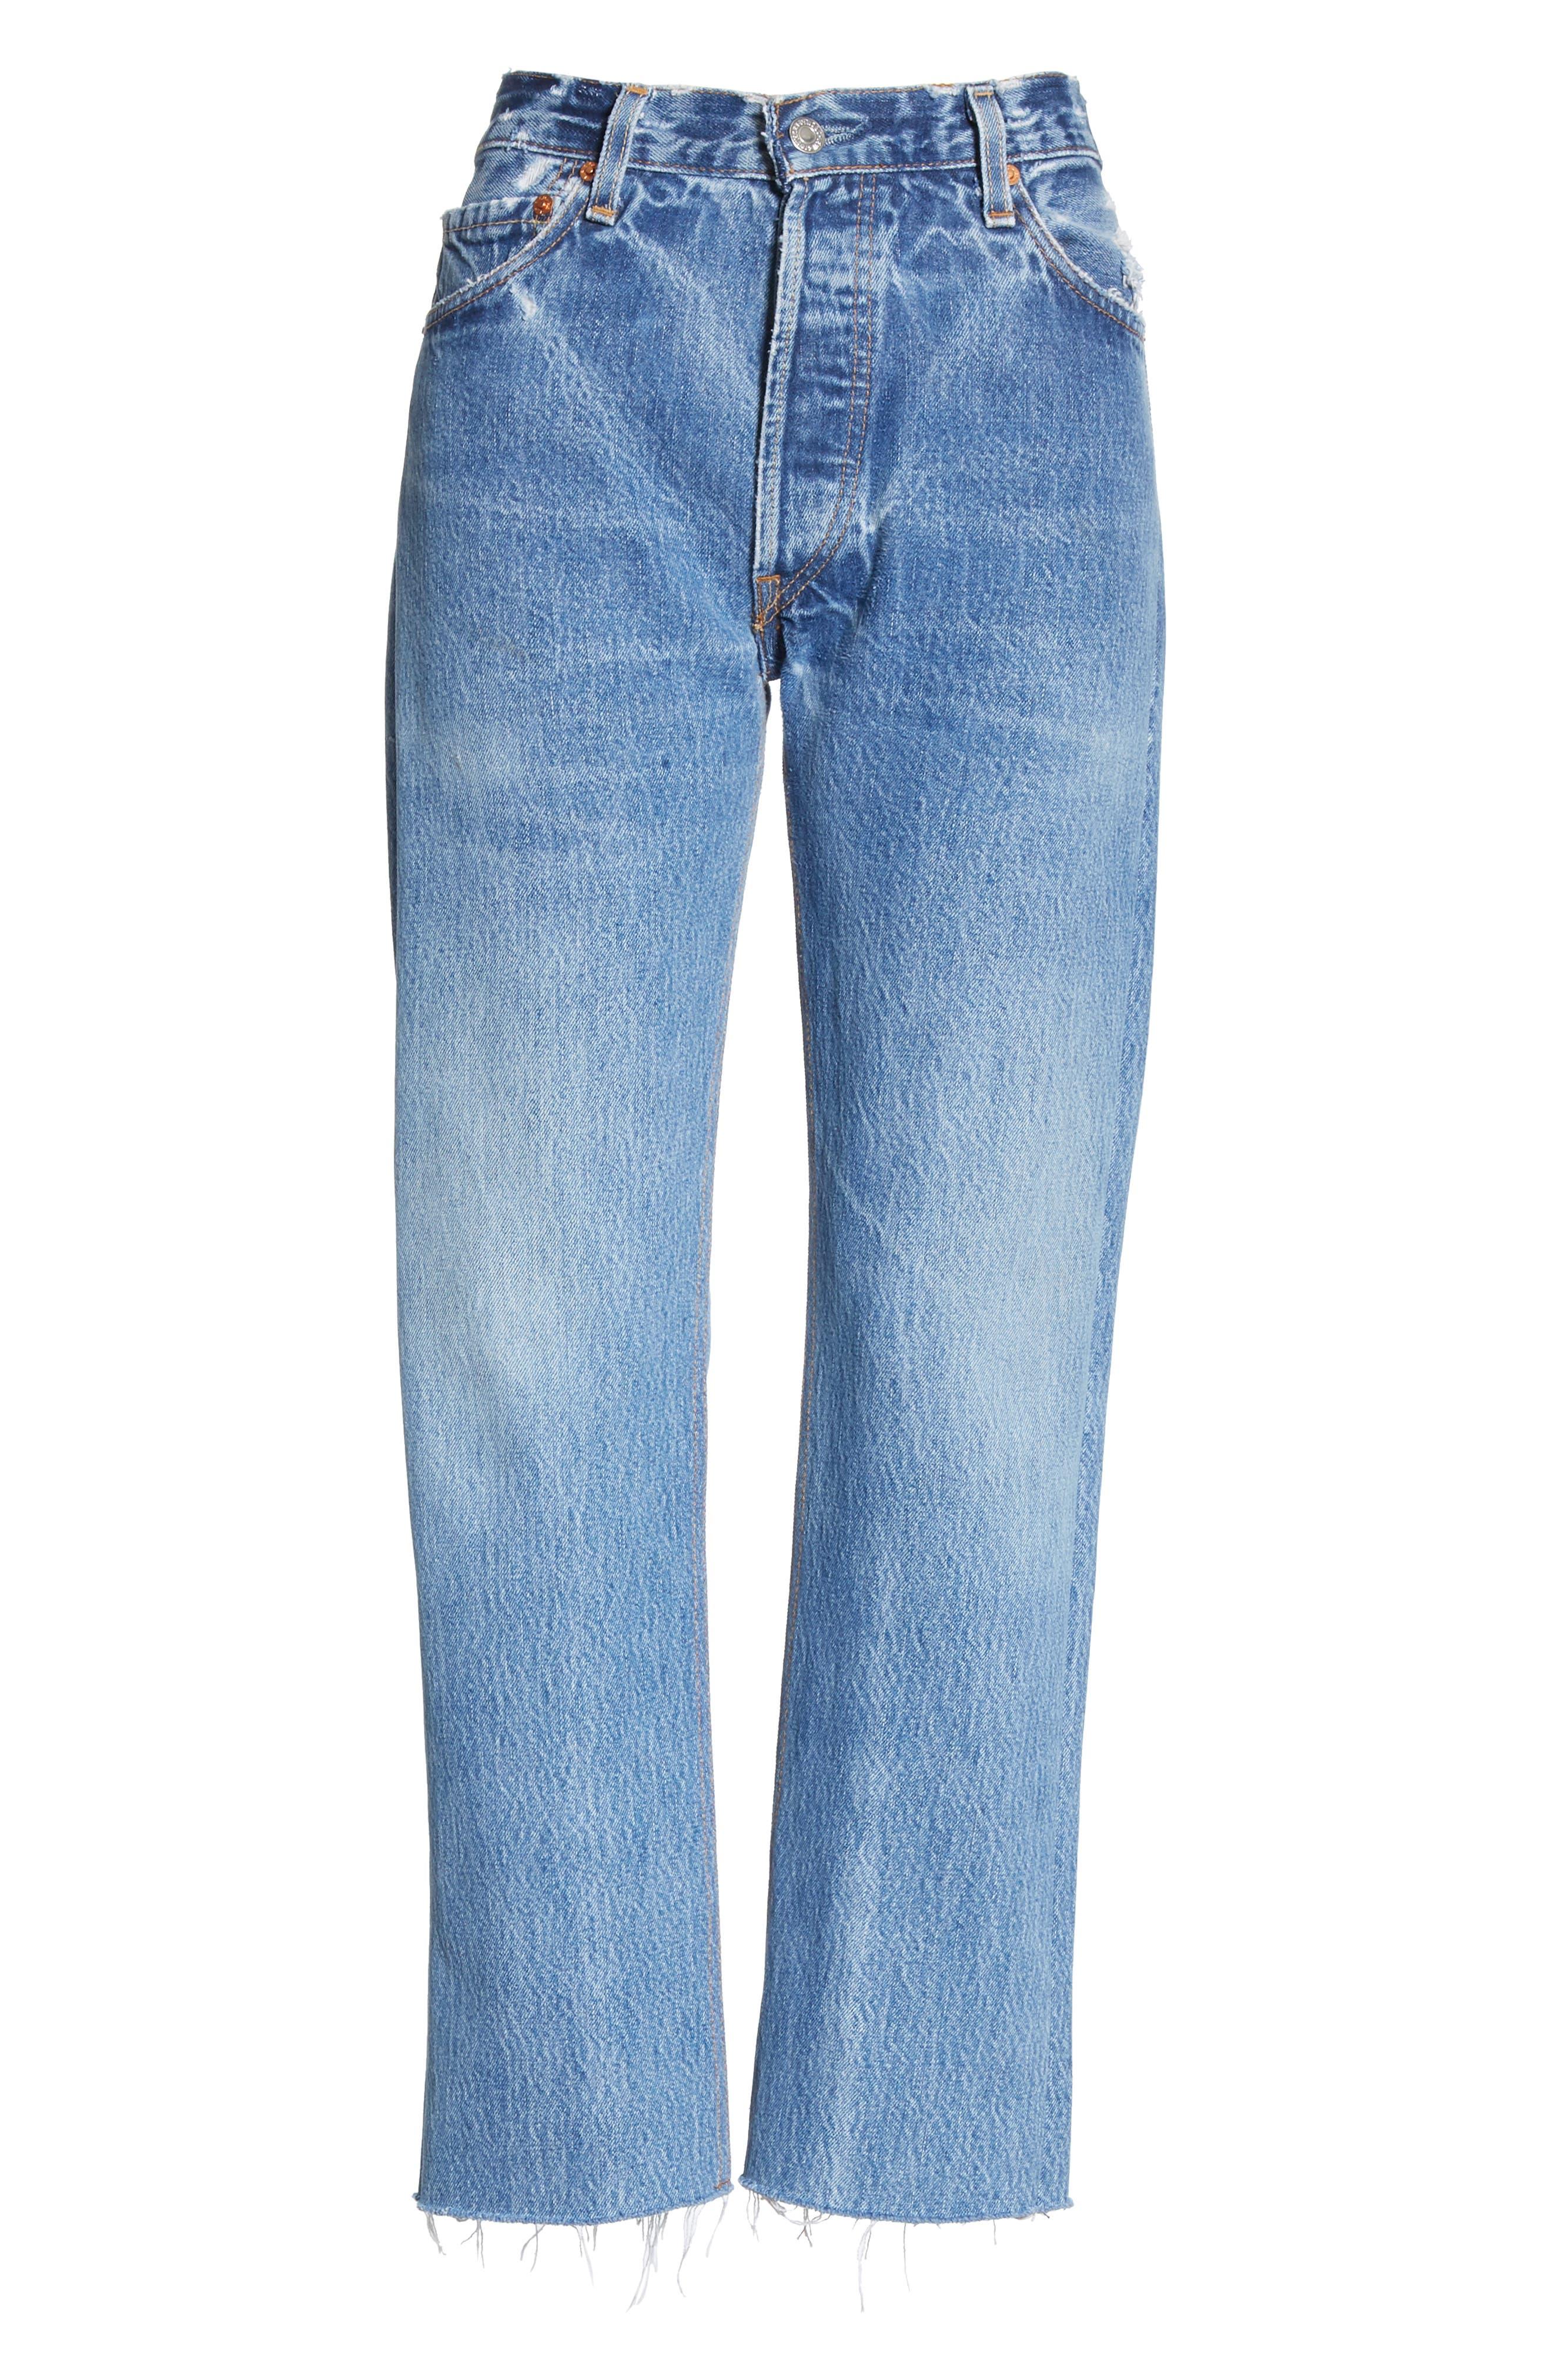 High Waist Stovepipe Jeans,                             Alternate thumbnail 6, color,                             INDIGO